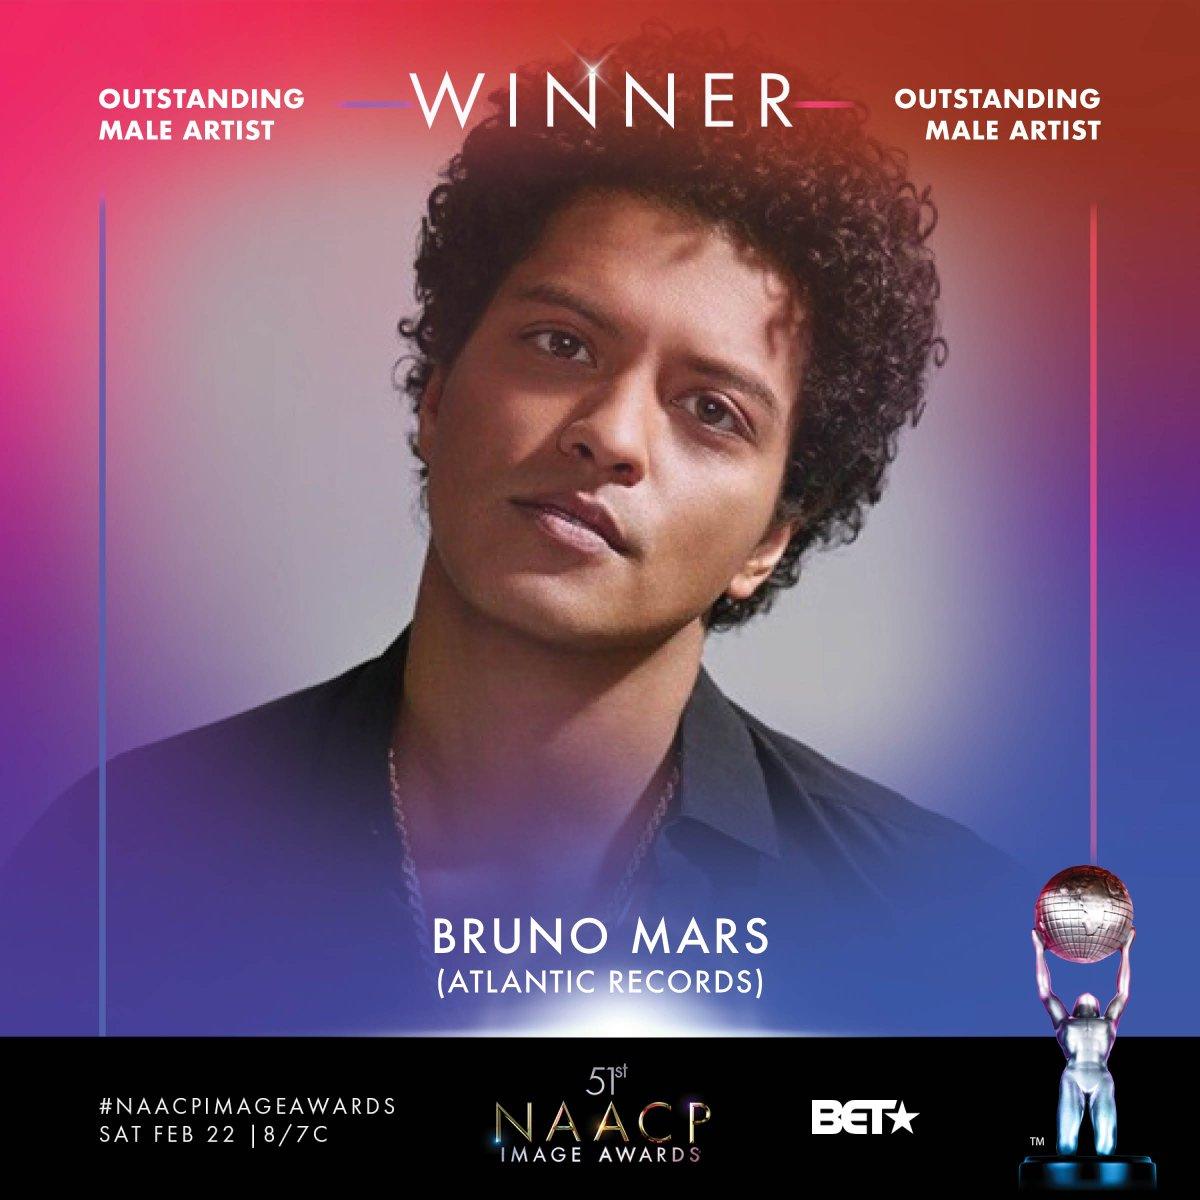 Congrats Outstanding Male Artist winner - @brunomars #NAACPImageAwards https://t.co/9KtH37tiMf